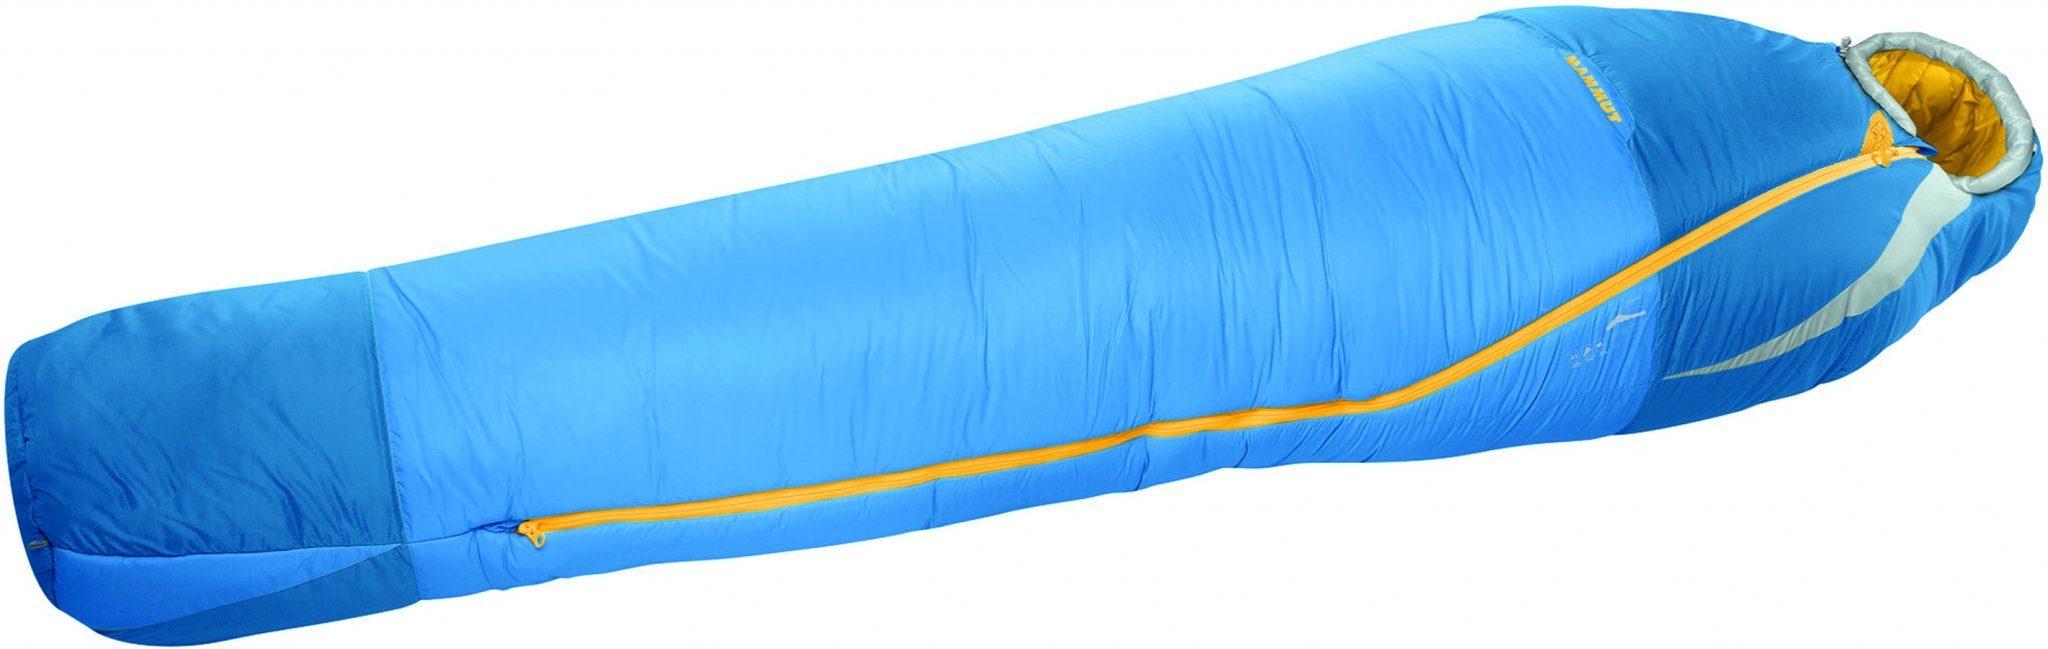 Mammut Schlafsack »Kompakt MTI Spring 195 Sleeping Bag«